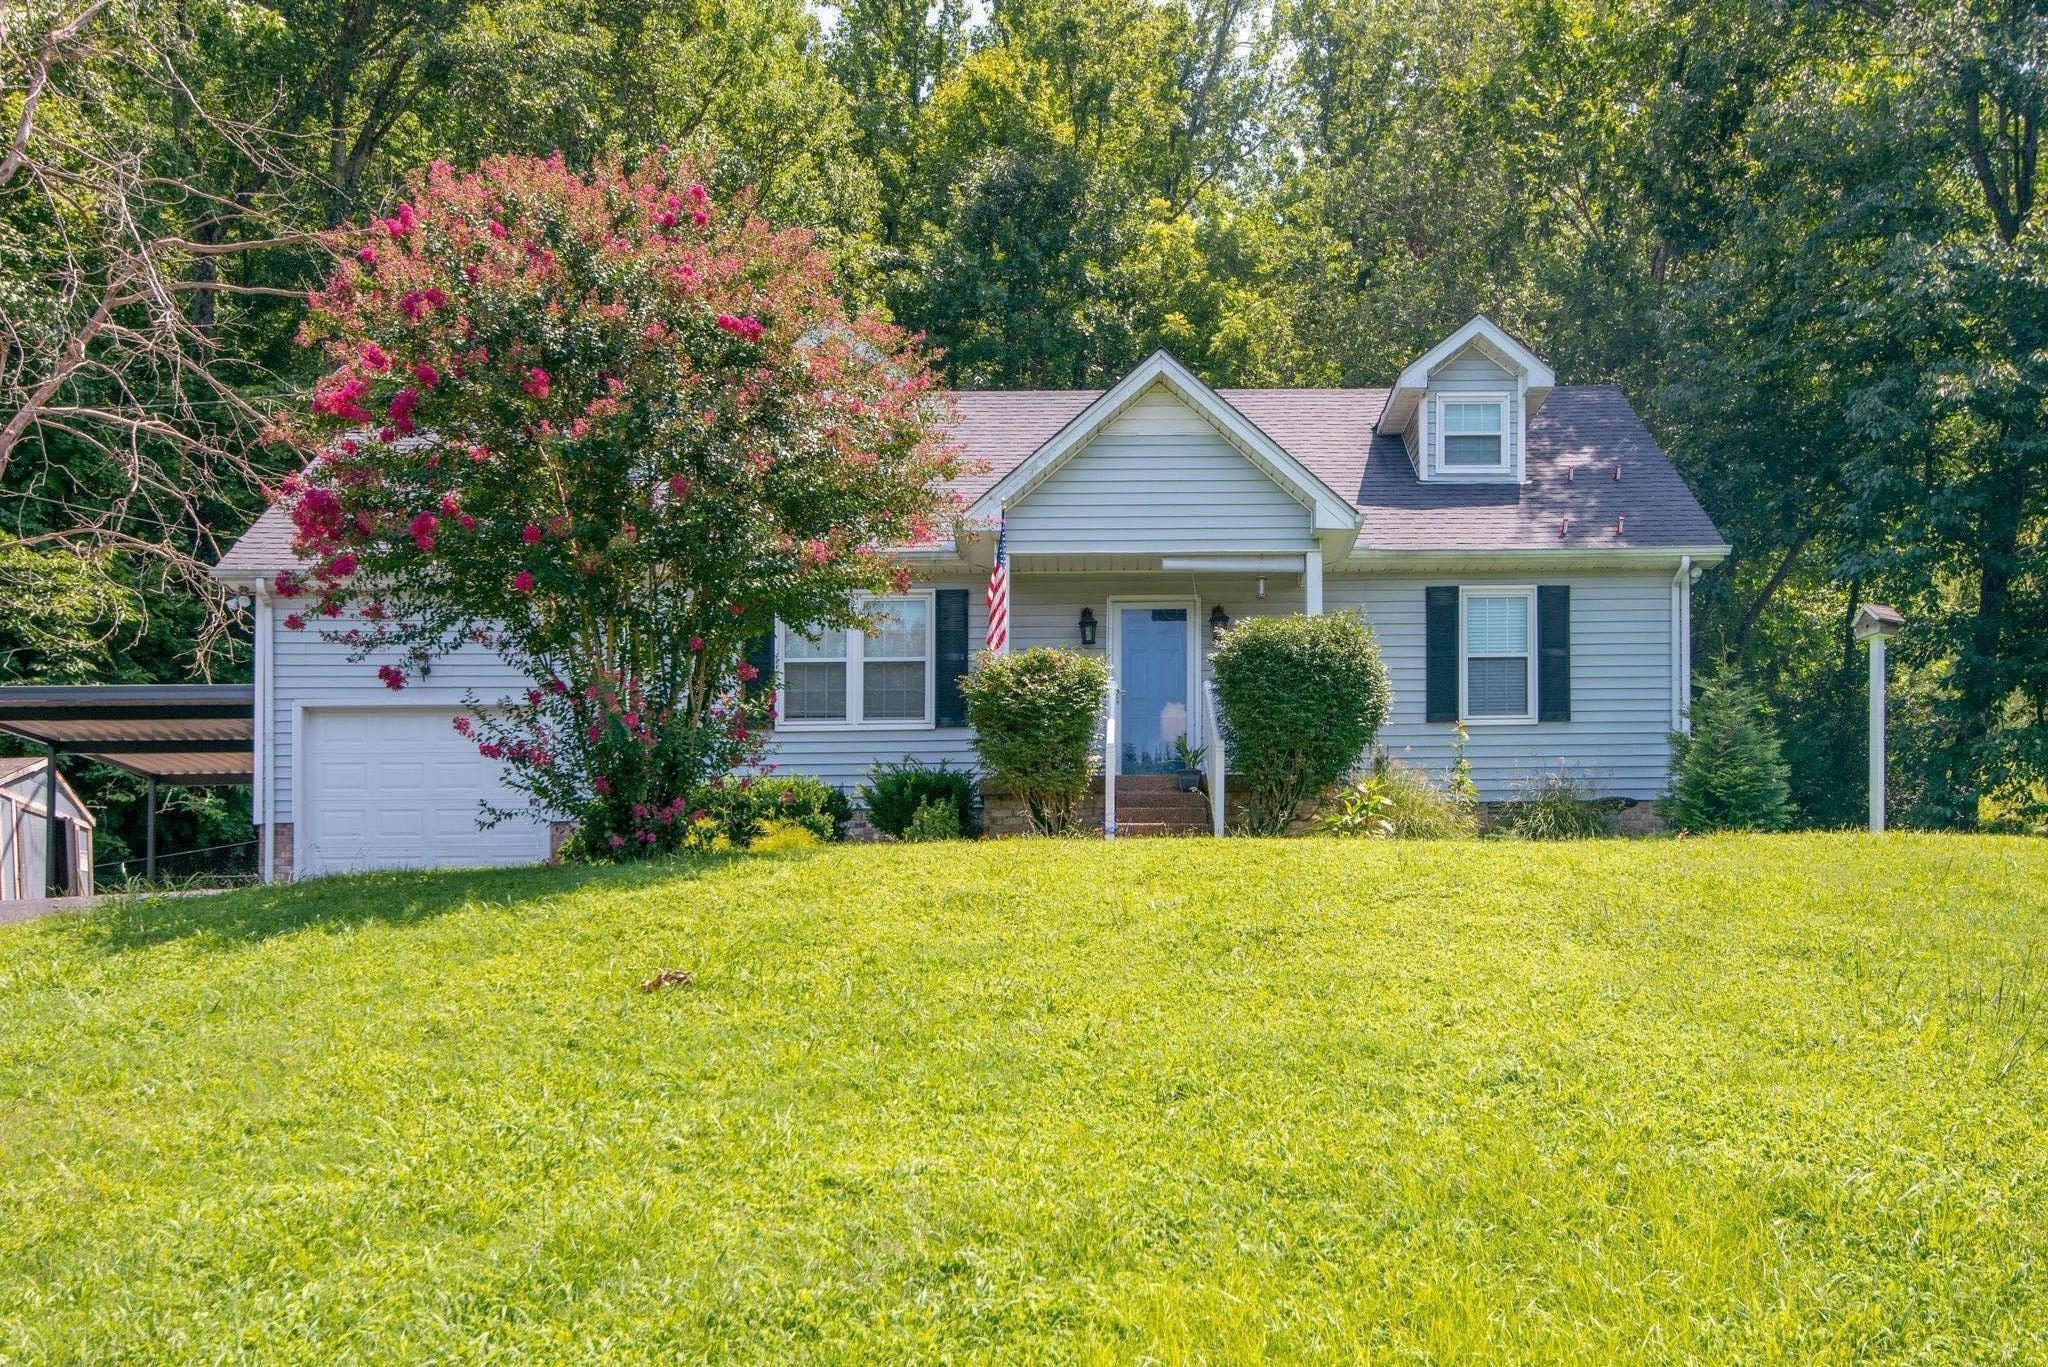 4647 Whites Creek Pike, Whites Creek, TN 37189 - Whites Creek, TN real estate listing